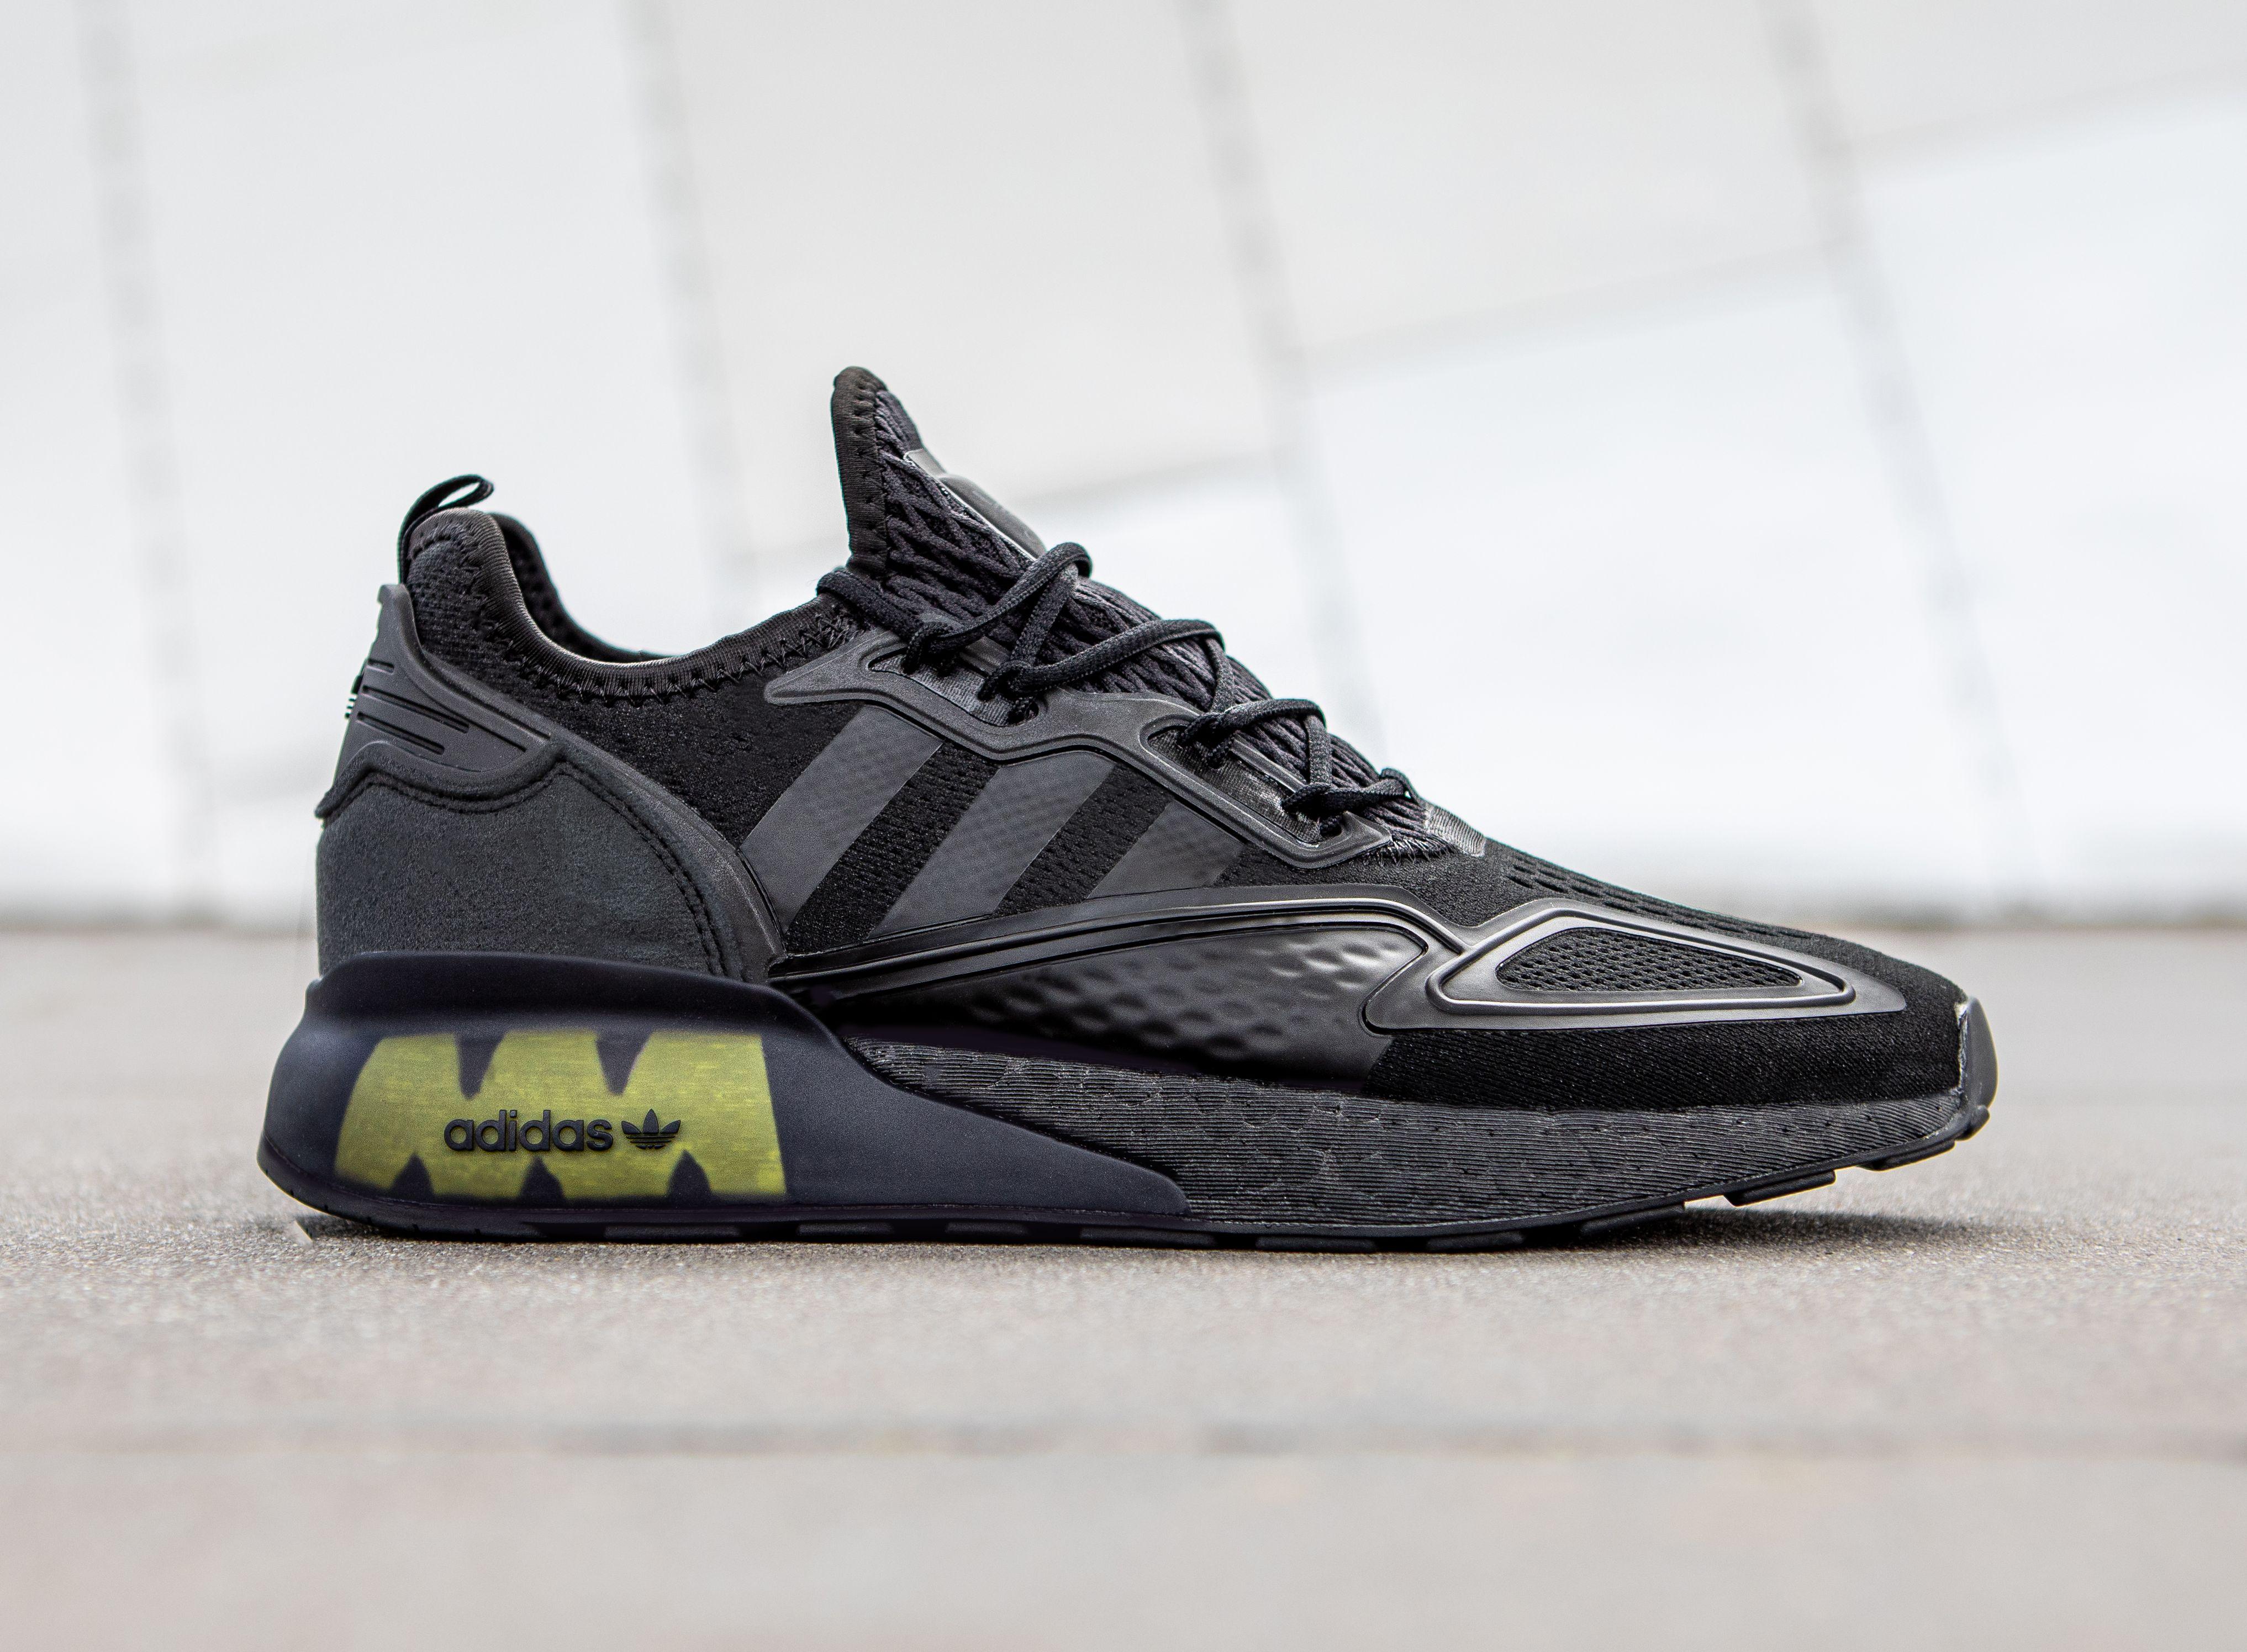 adidas ZX 2K BOOST (Black/Solar Yellow)